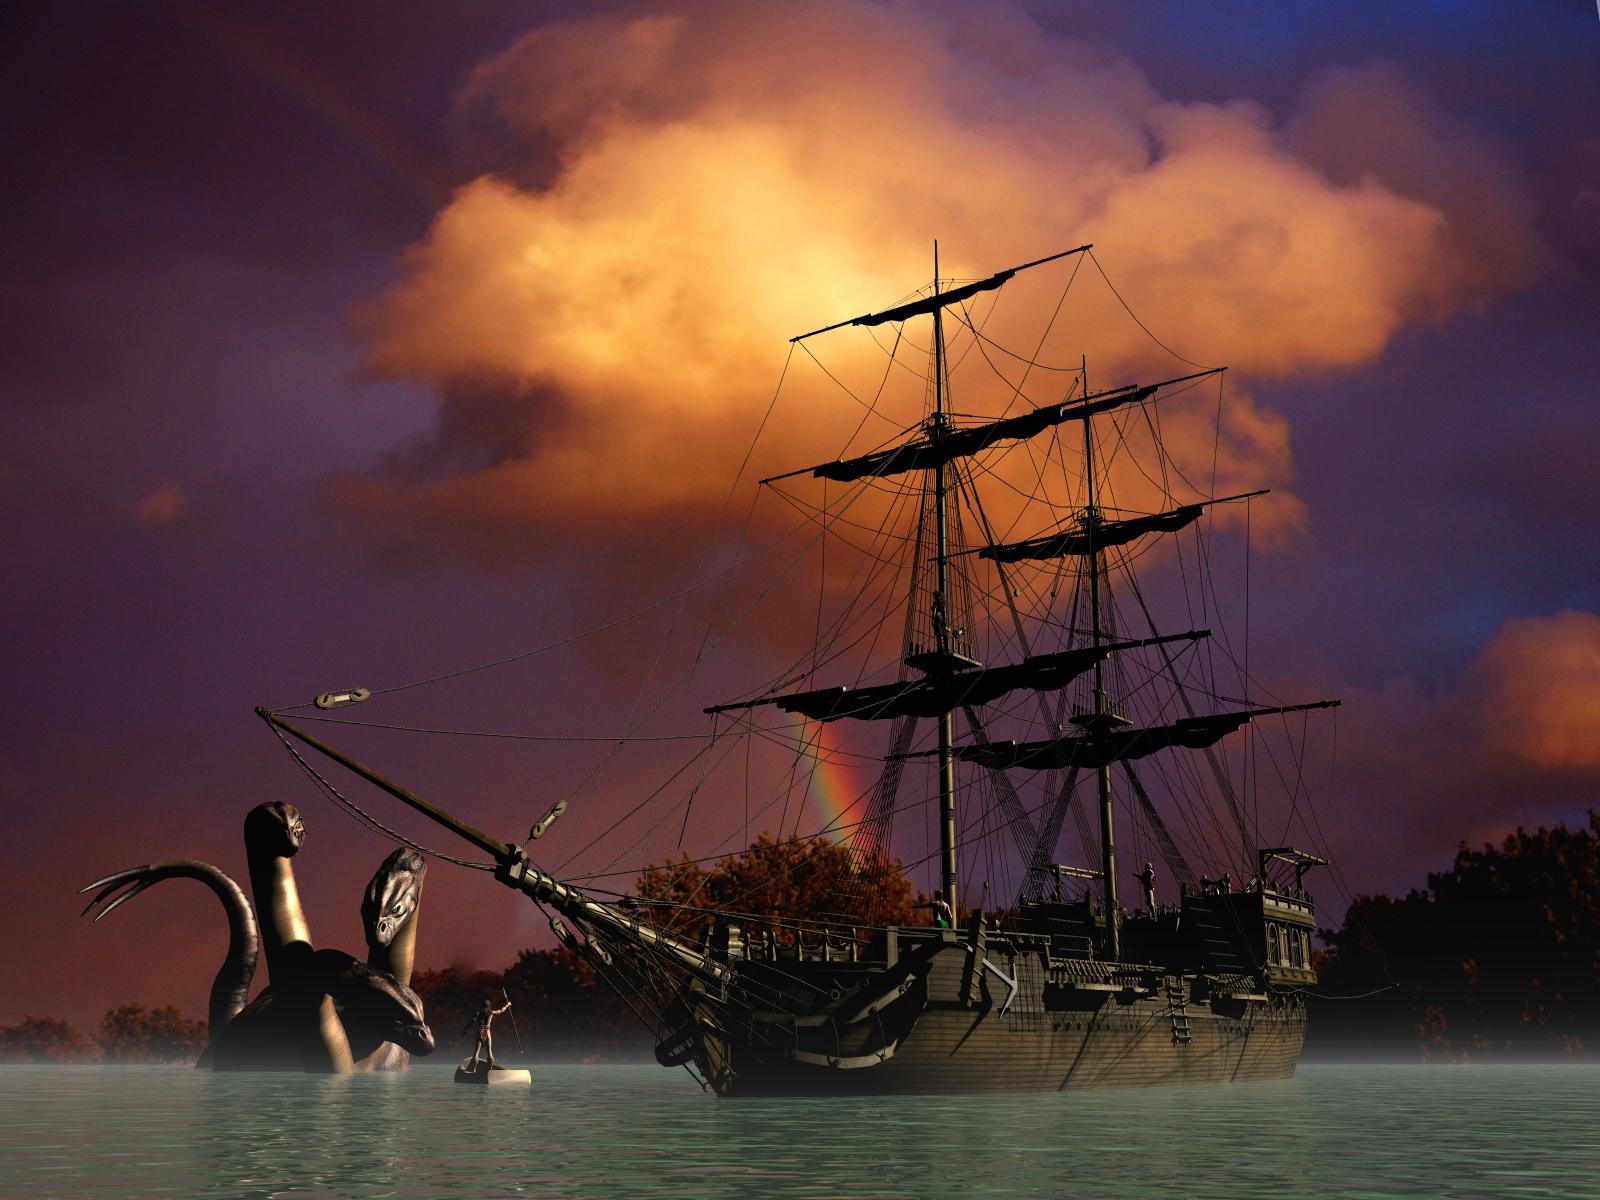 http://2.bp.blogspot.com/-JnttJSsUyz8/UJWQMCB2VgI/AAAAAAAABDs/LNIIDbtG5-8/s1600/3D+Pirates+of+Caribbean+ships+wallpapers+(18).jpg